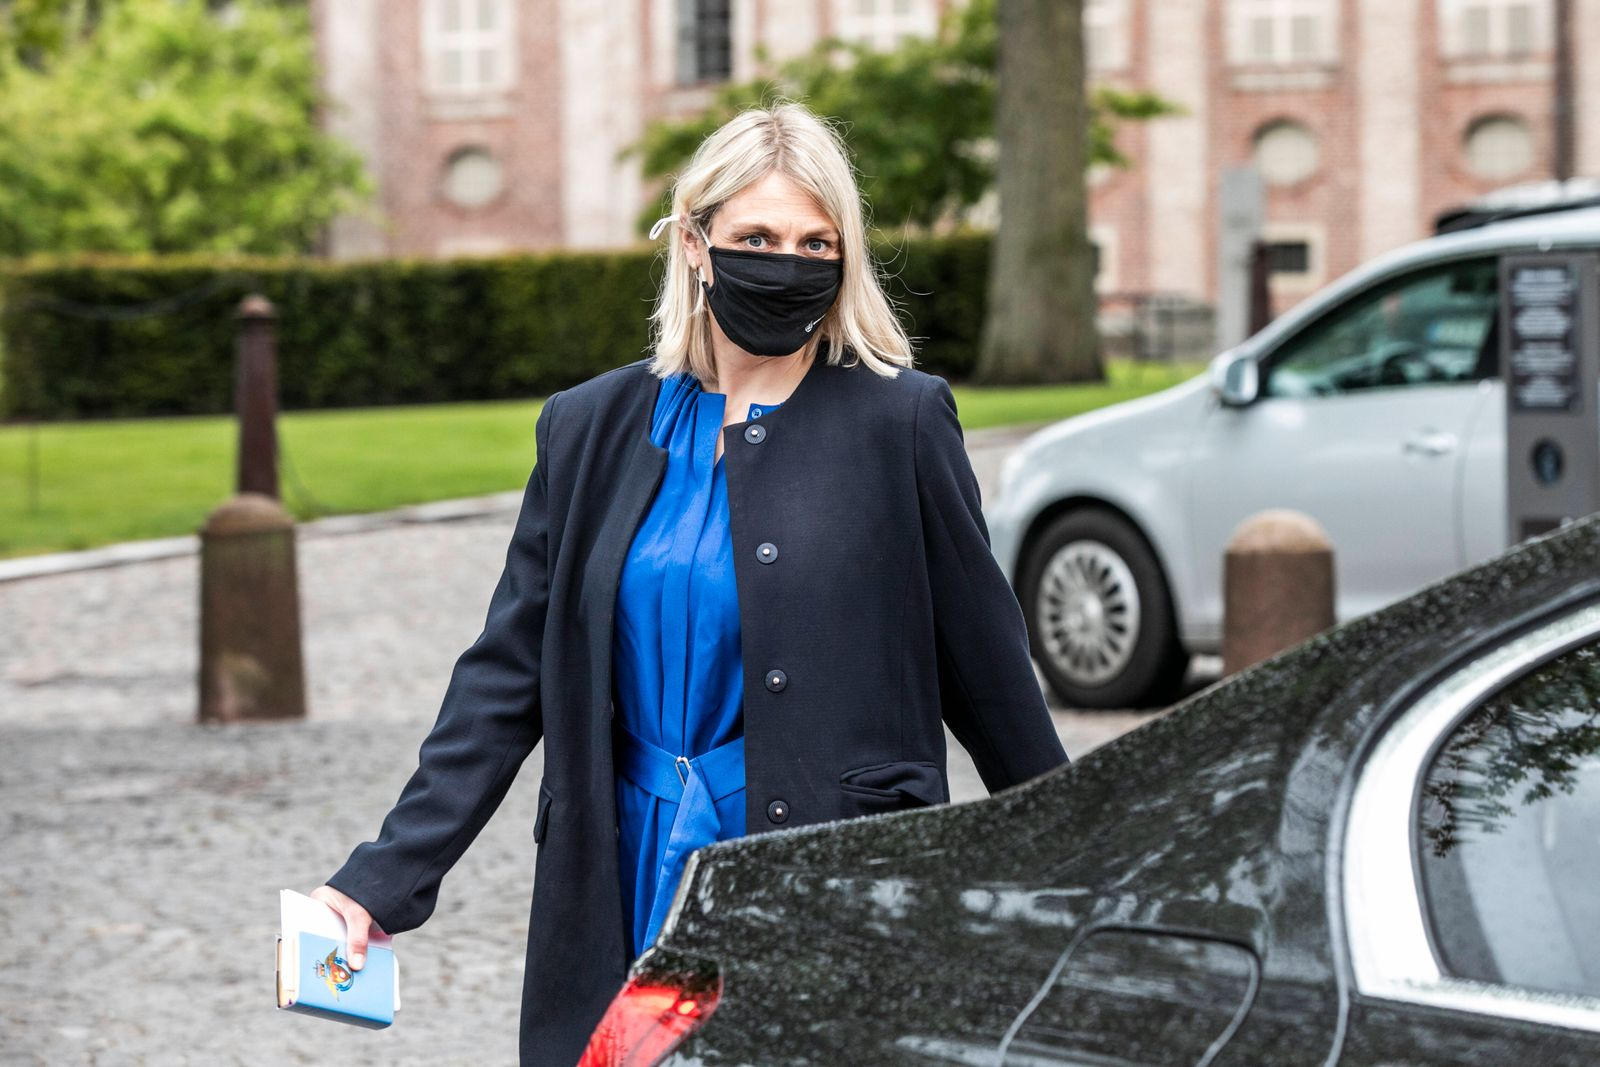 Forsvarsminister Trine Bramsen forlader vaernspraestetjenestens 50 aars-jubilaeum som fejres med festgudtjeneste i Holme